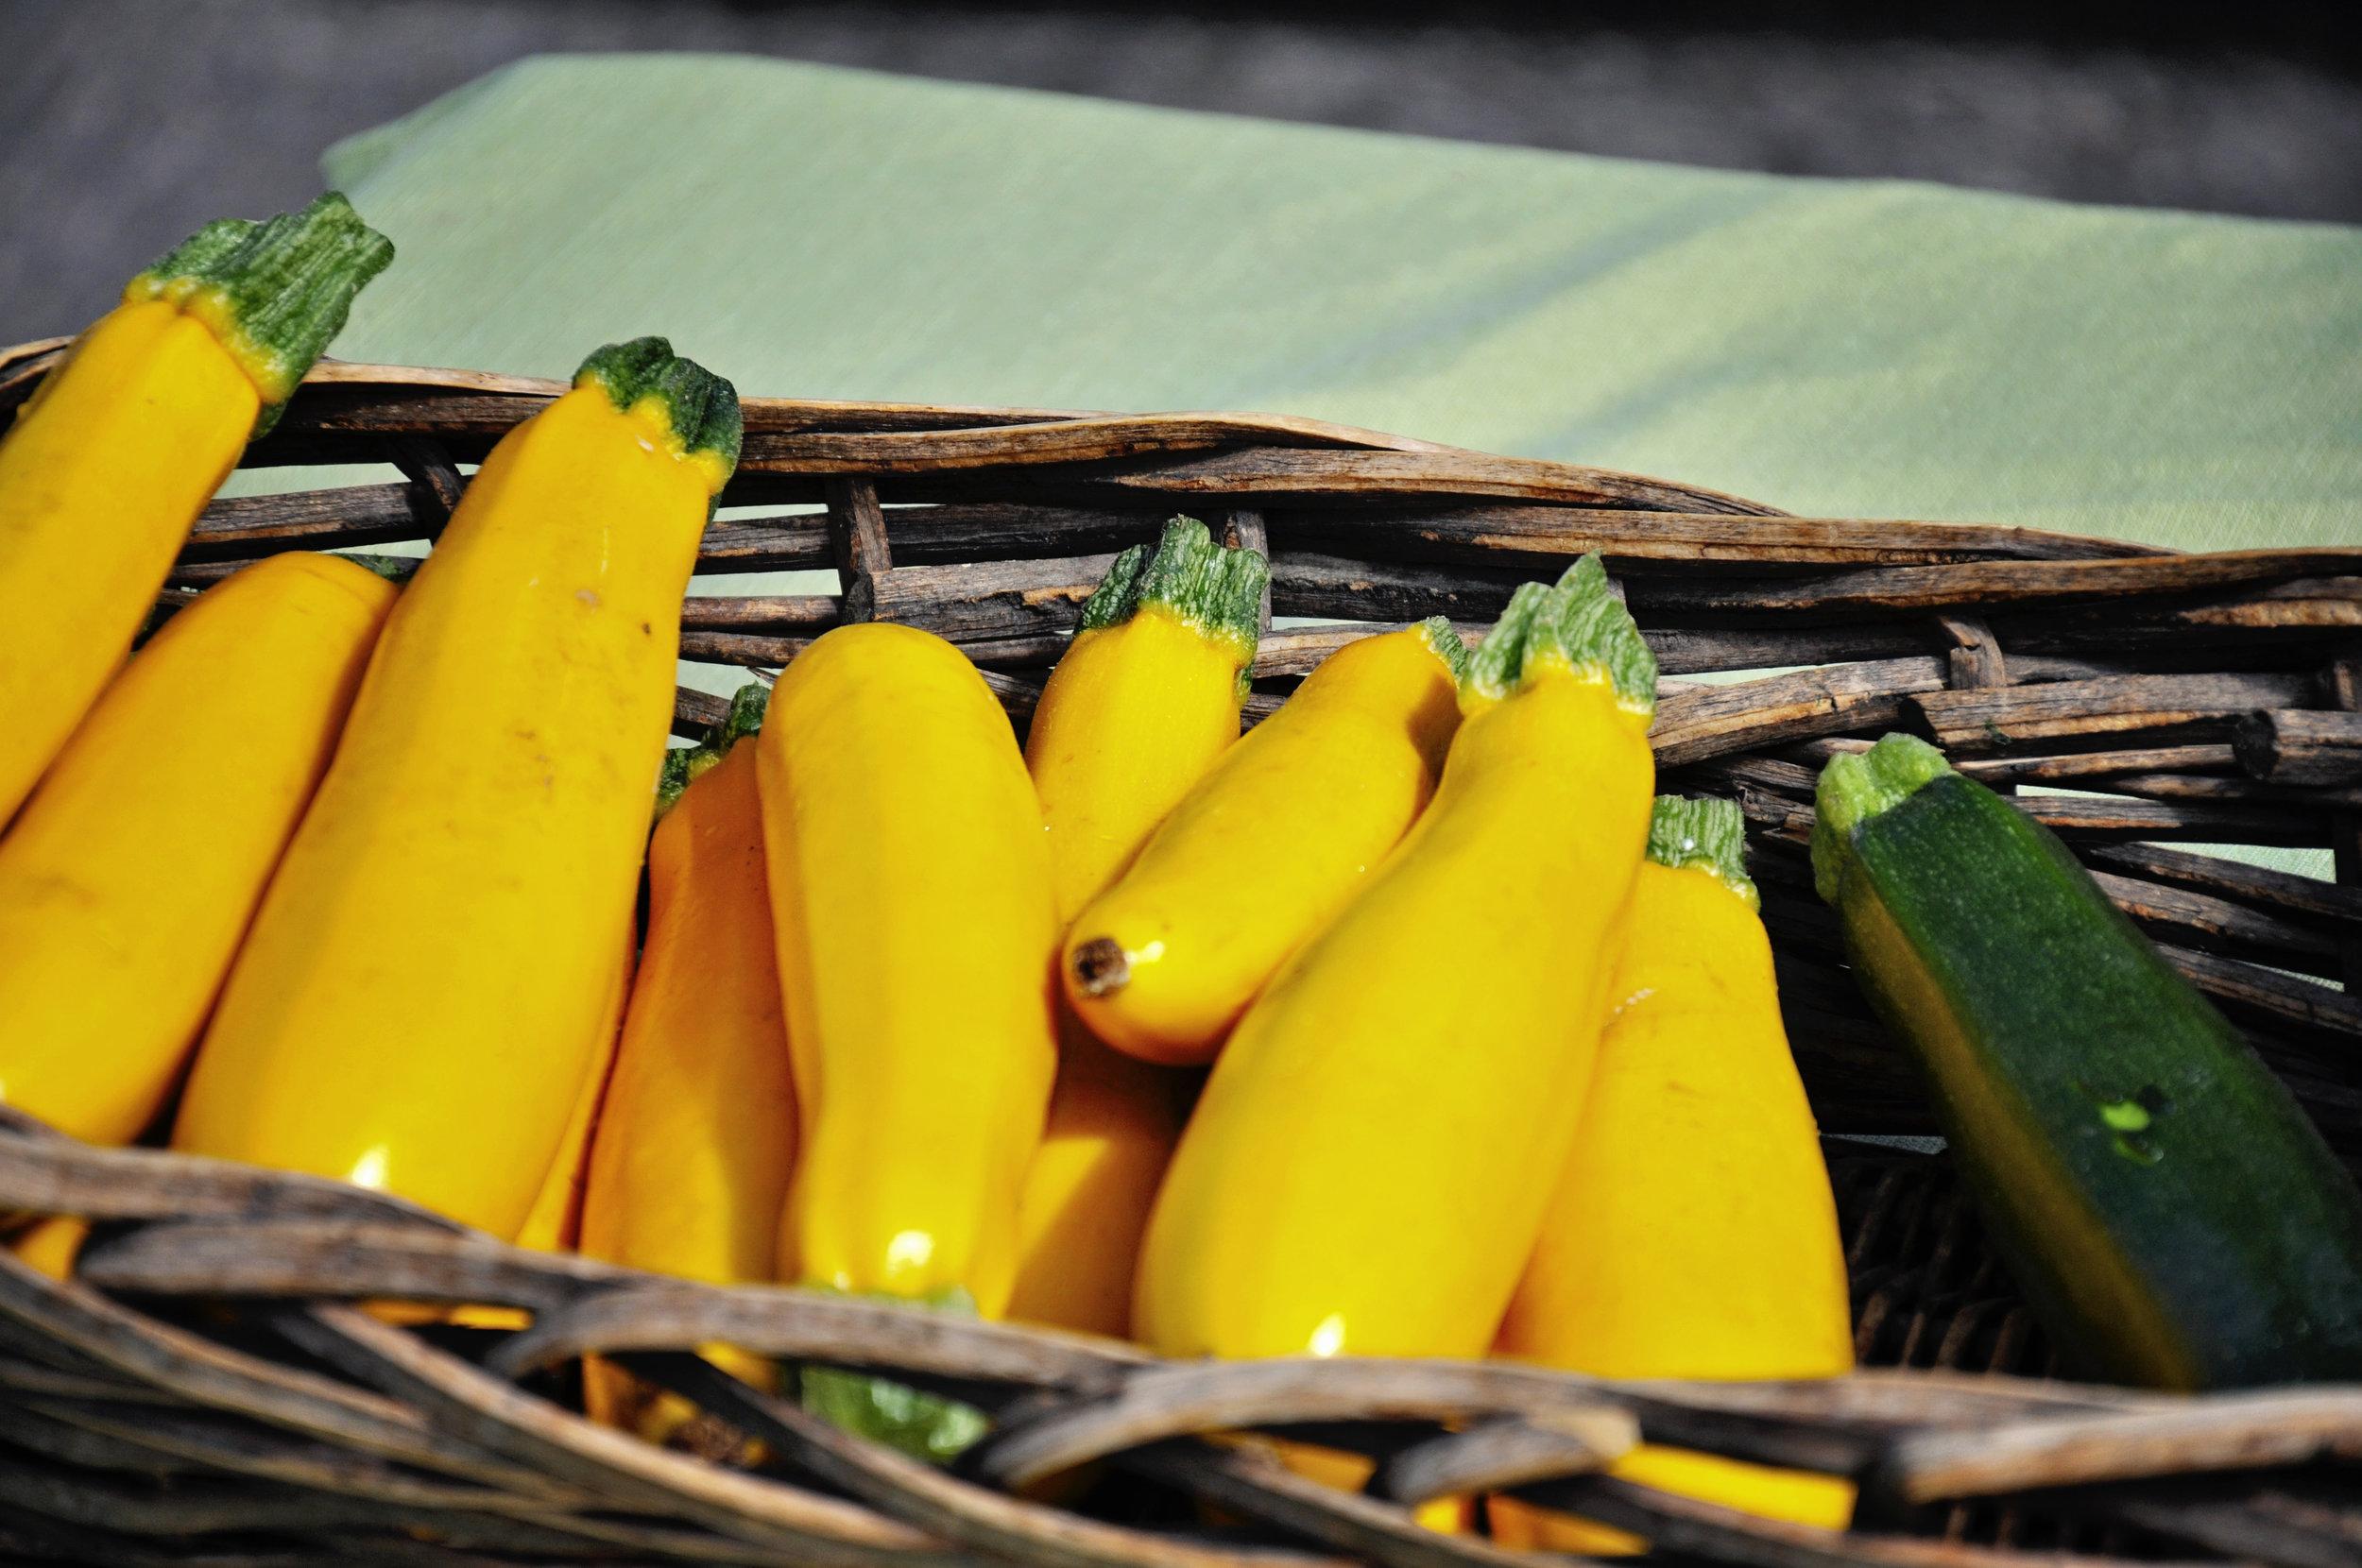 Fresh Farmers Market Squash and Zucchini